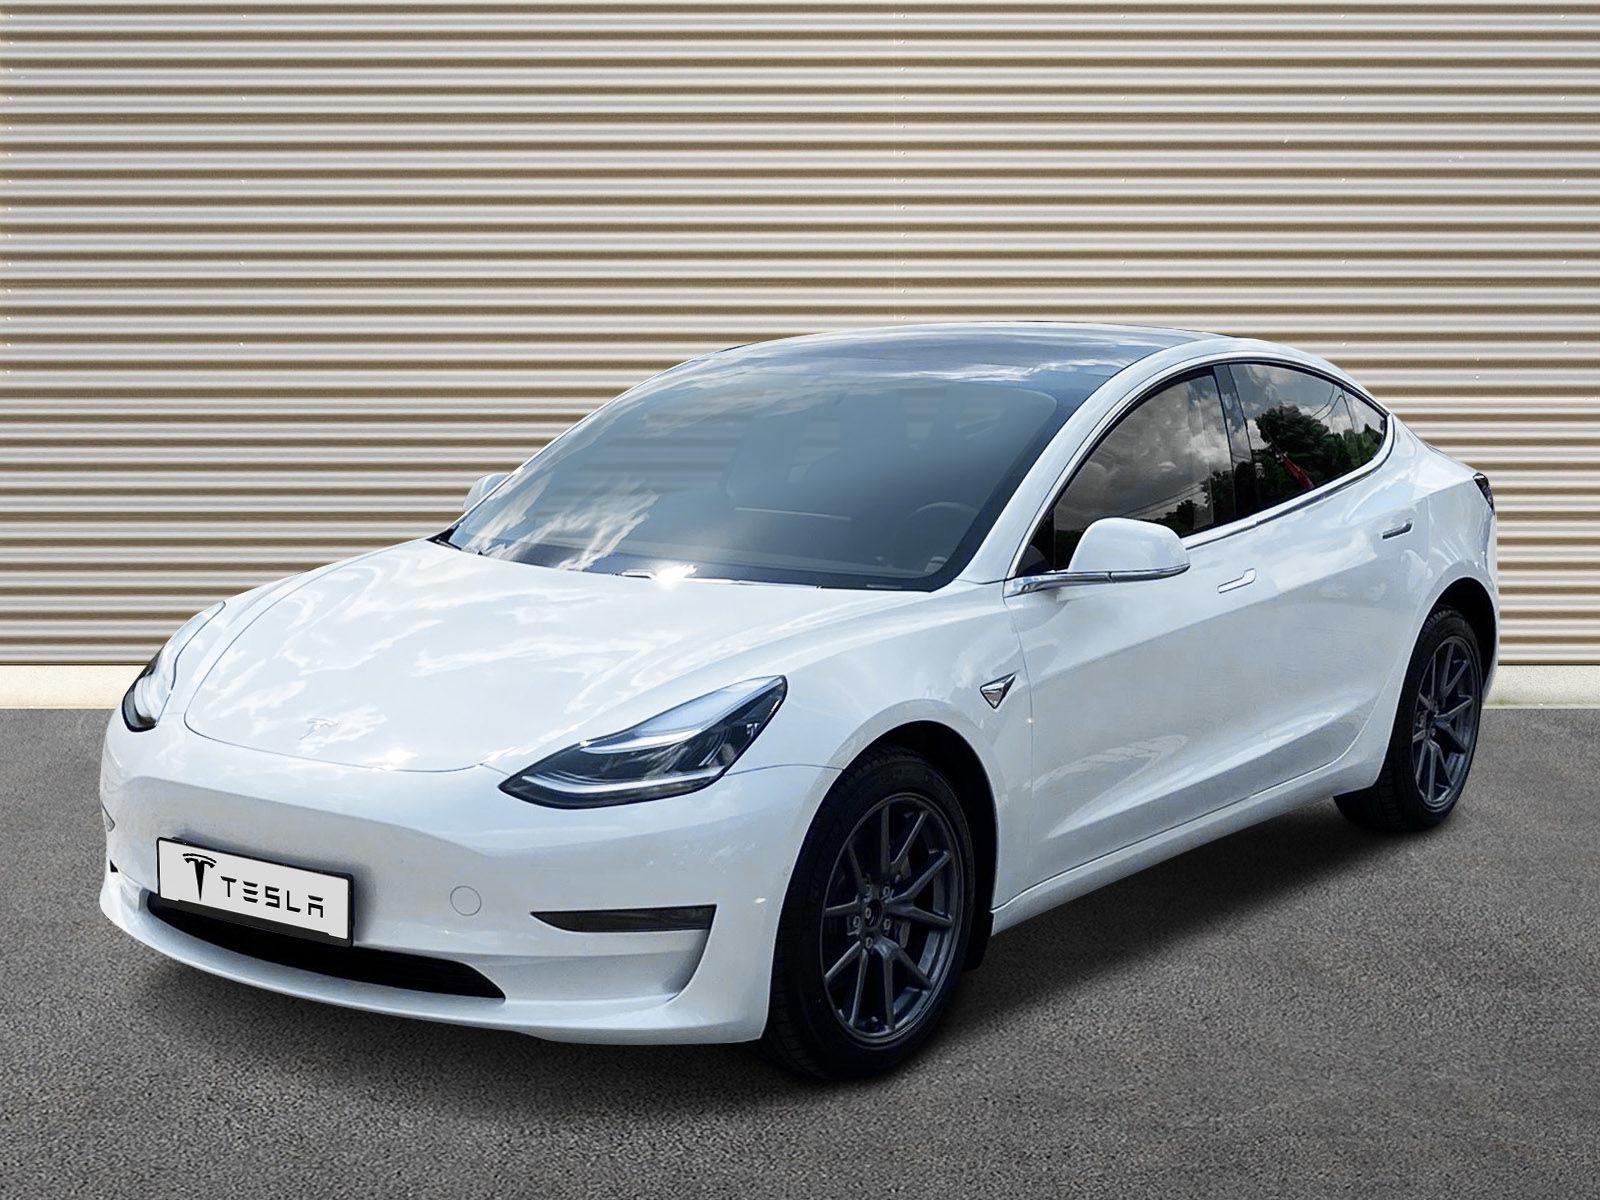 Tesla Model 3 LR D 2097_01 weiss (1)